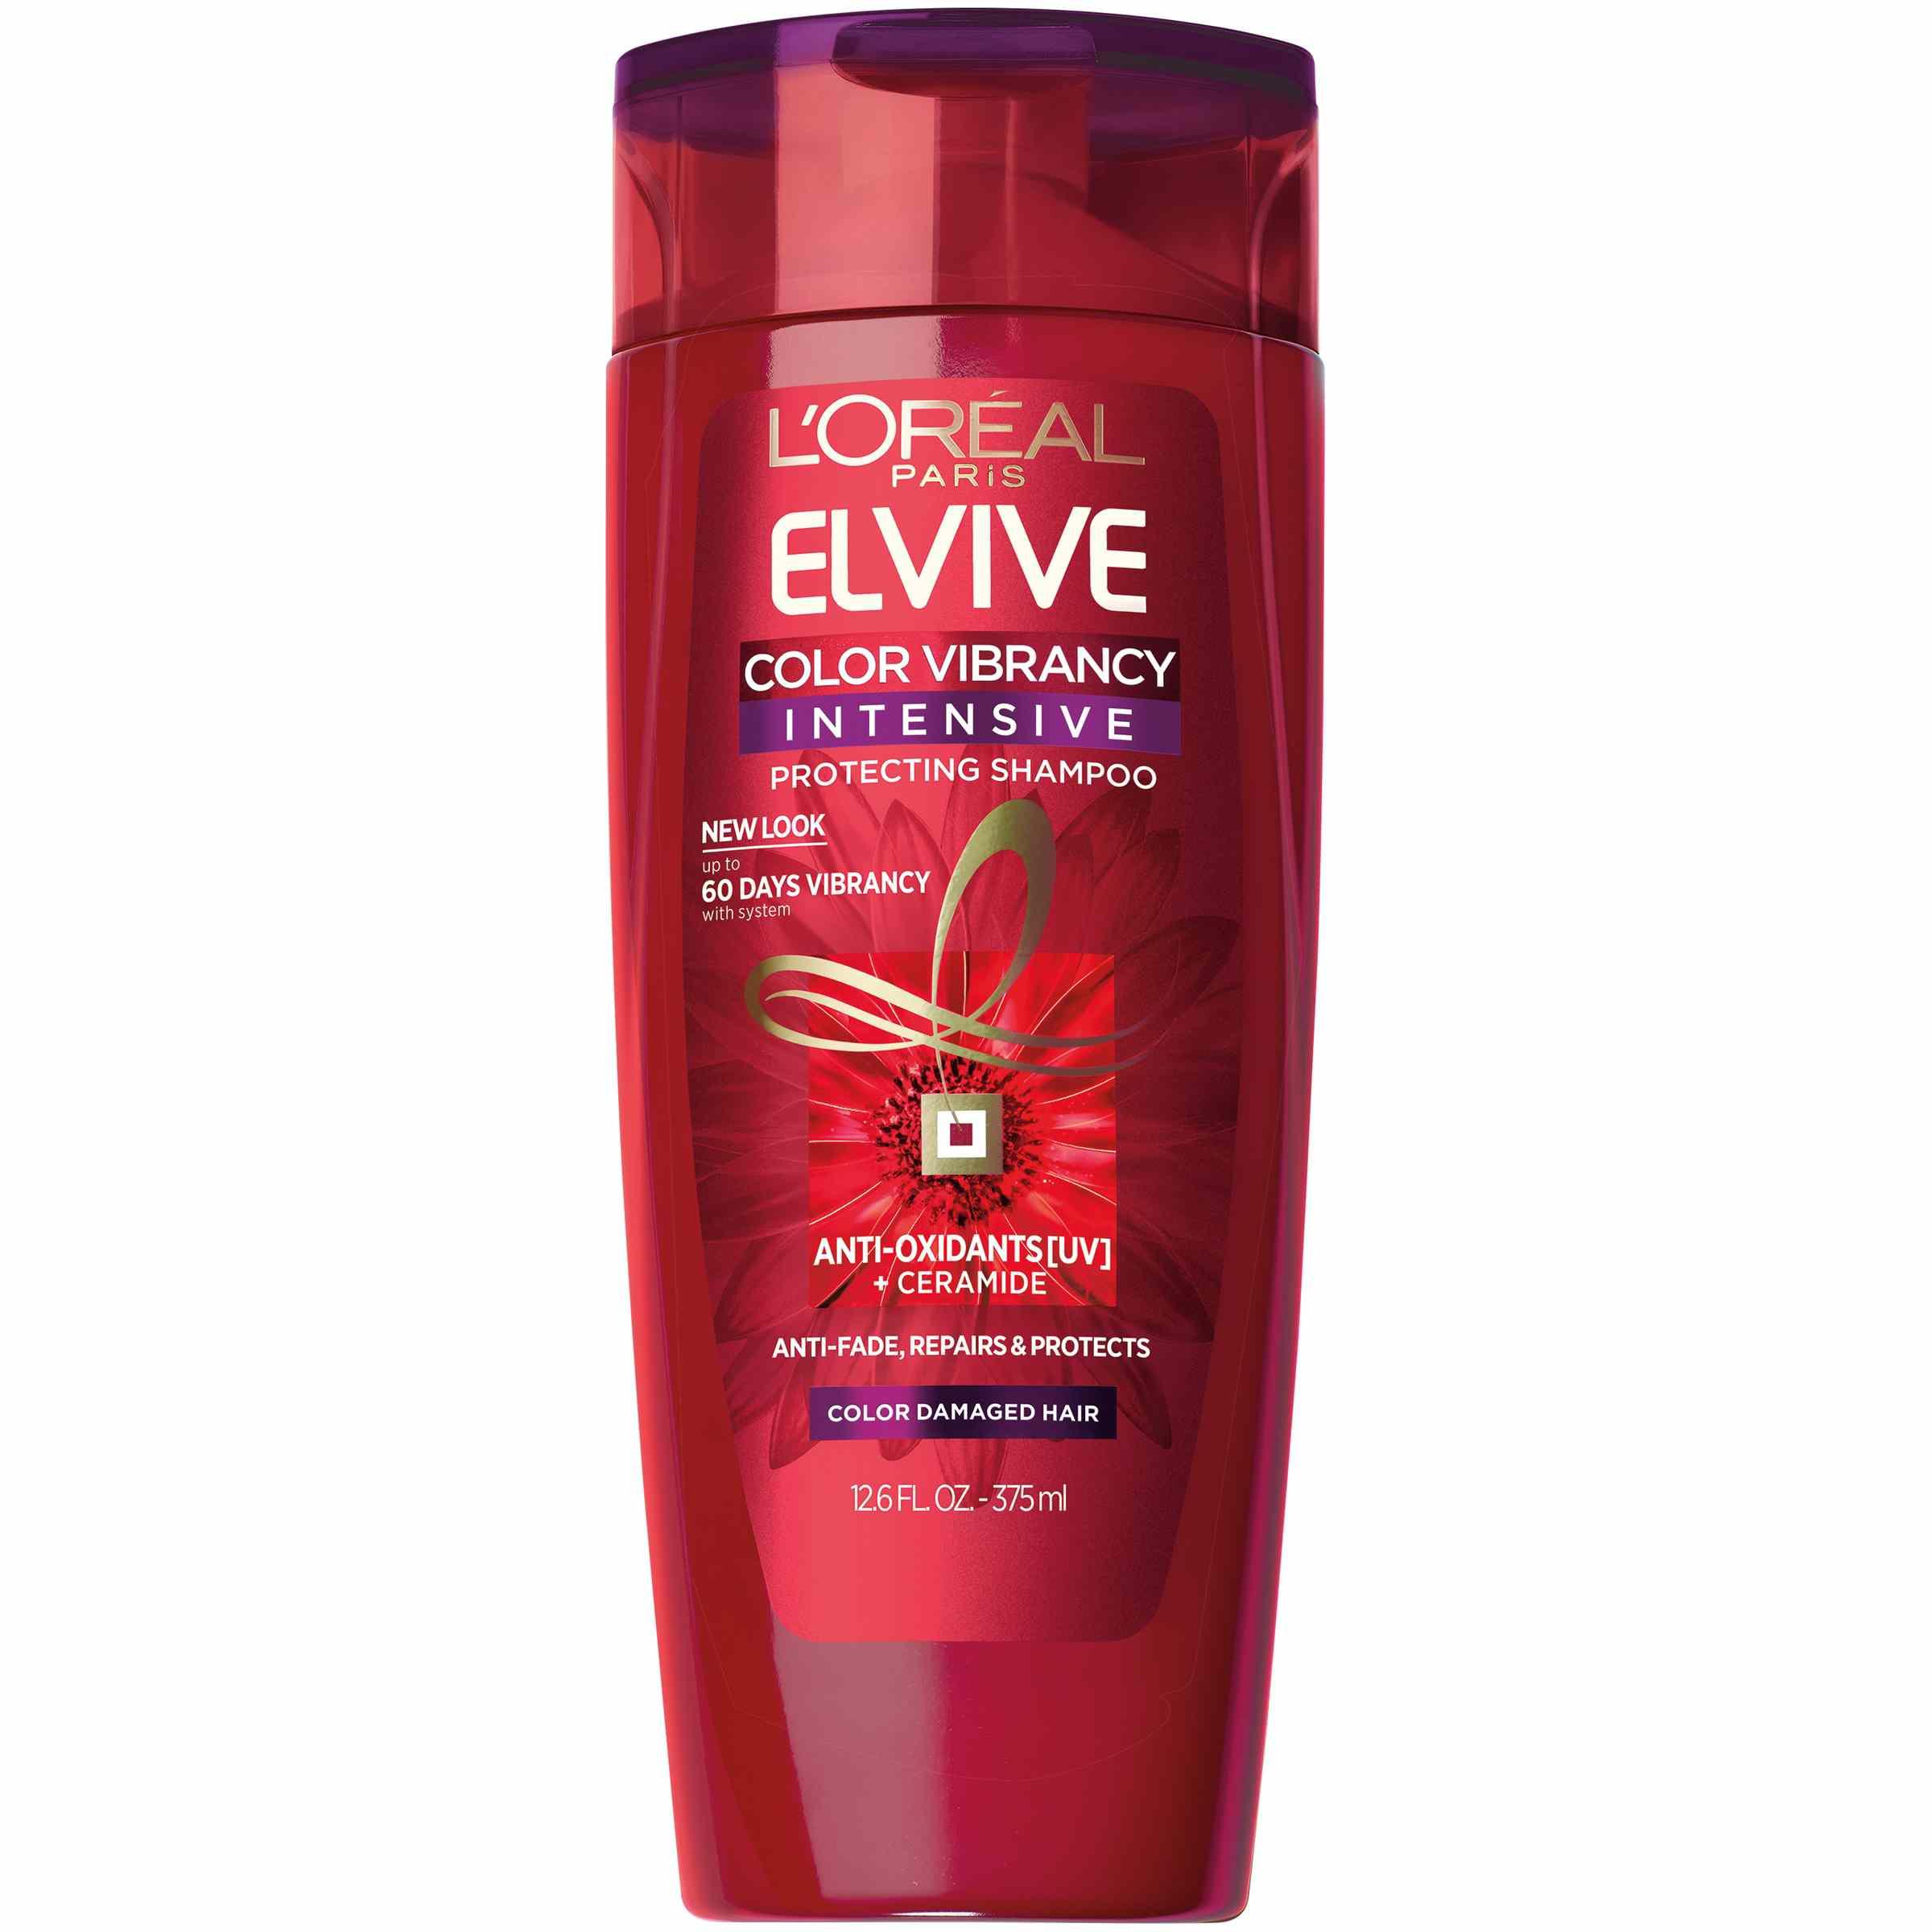 L'Oreal Paris Elvive Color Vibrancy Intensive Protecting Shampoo